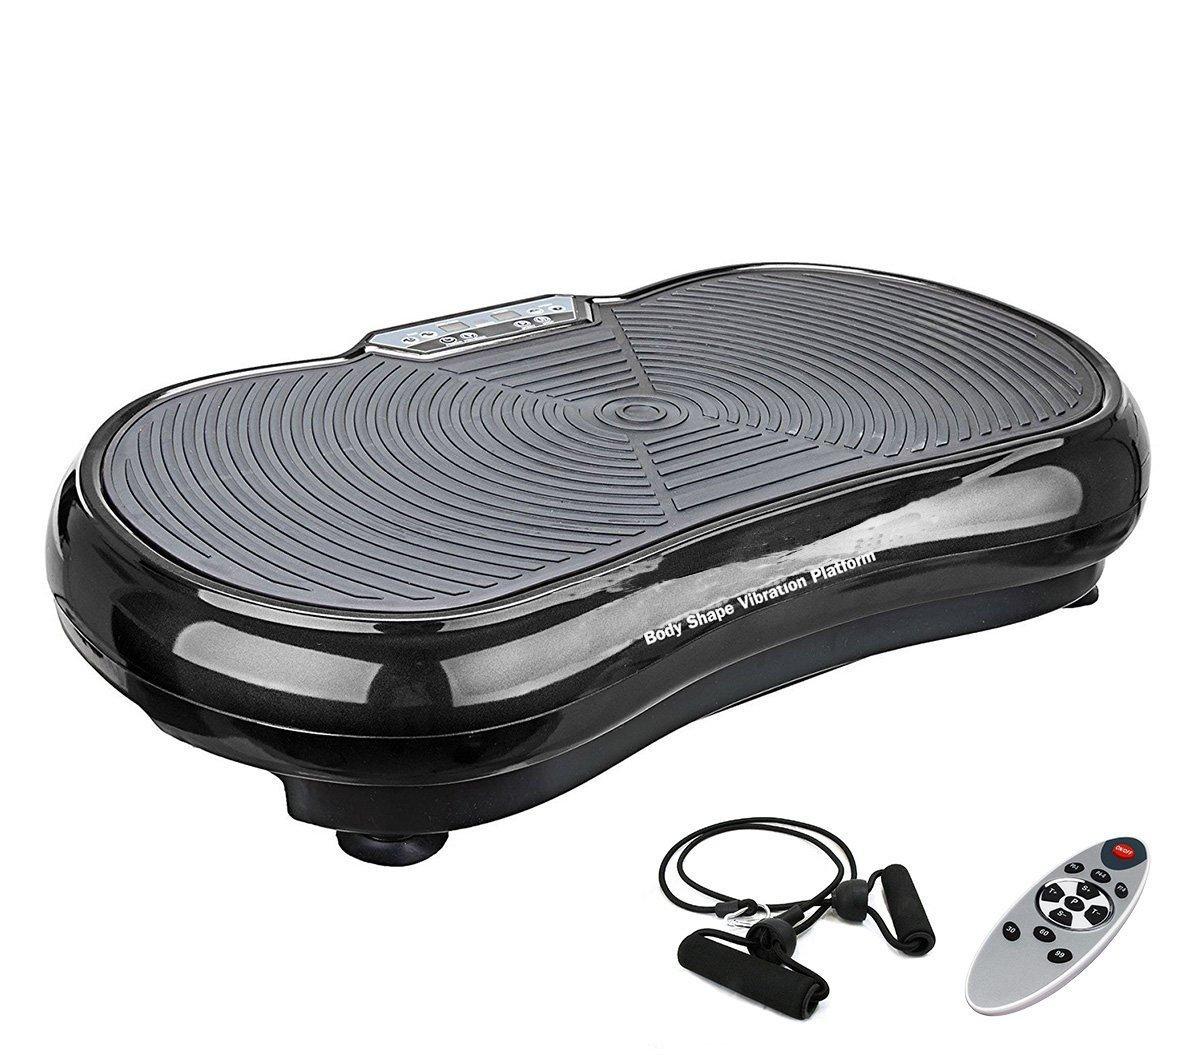 eshion NEW Vibration Machine Plate Platform Fitness Body Slim Shaper Massager (Black)